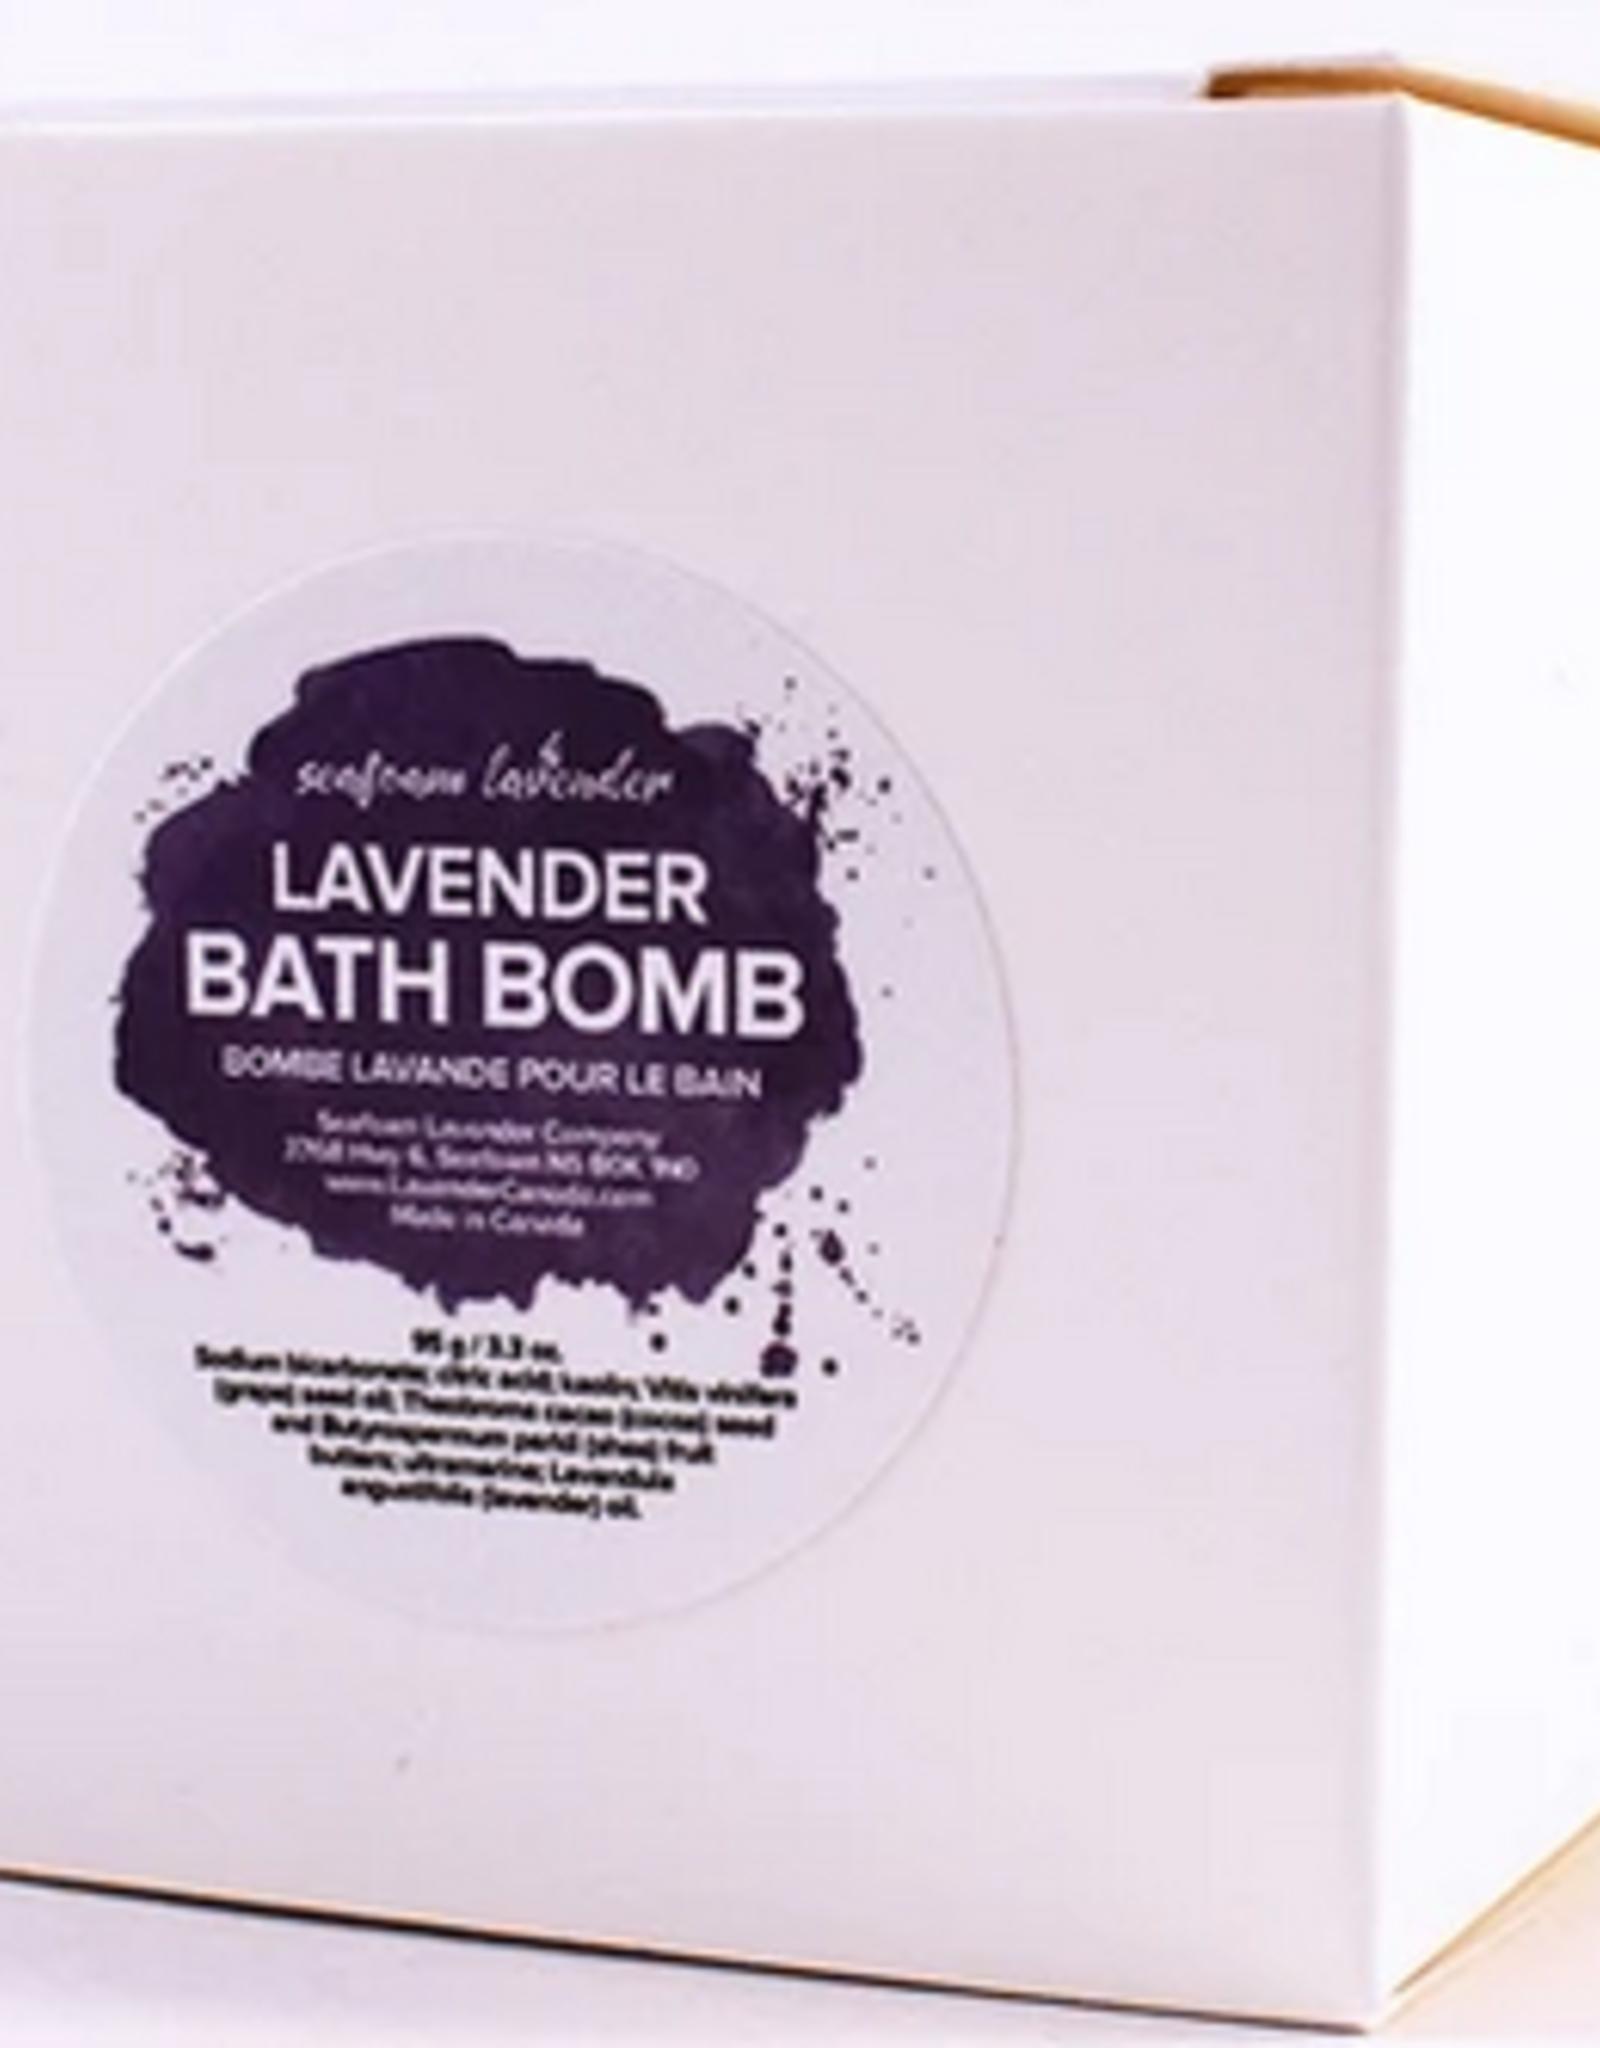 Seafoam & Lavender Bath Bomb Lavender